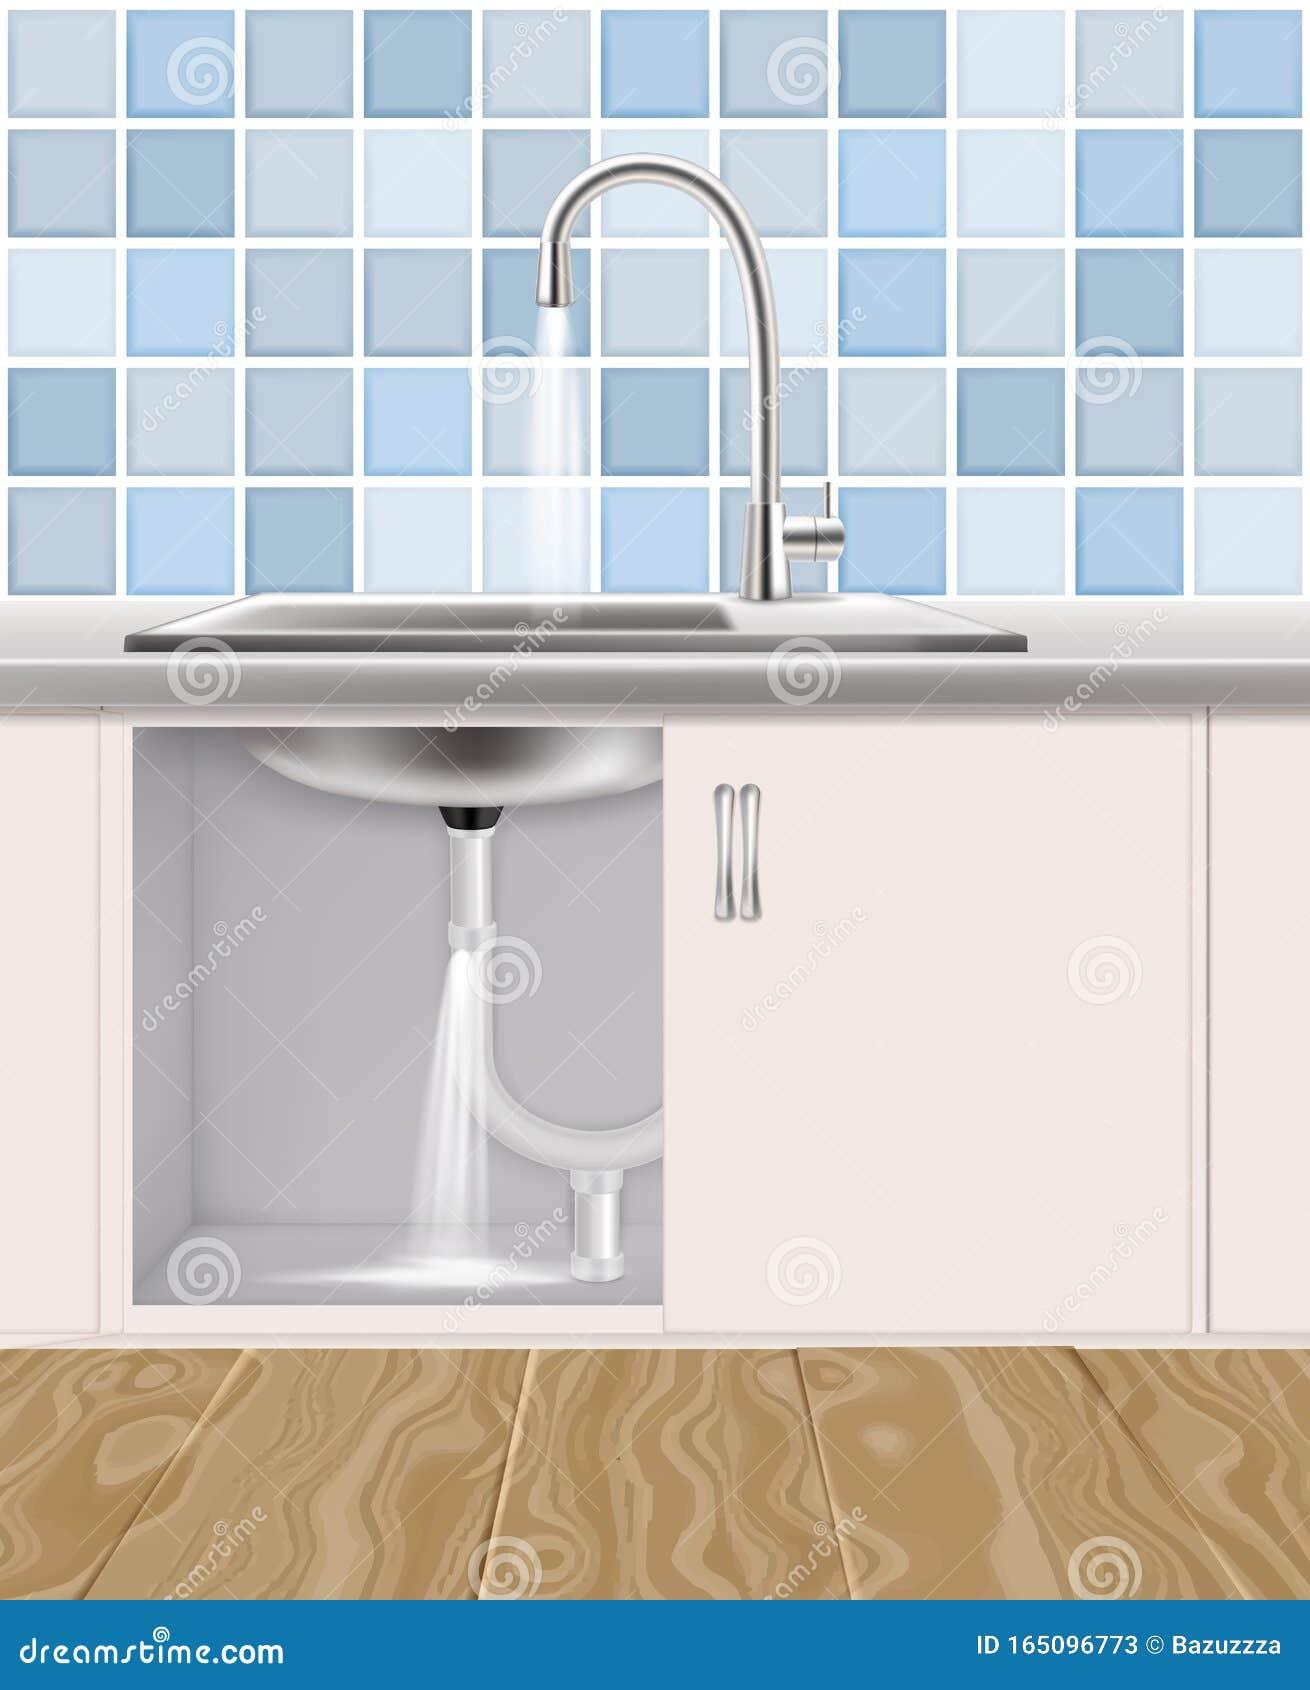 Leaking Water Pipe Plumbing Accident Vector Illustration Stock Vector Illustration Of Plumbing Leakage 165096773